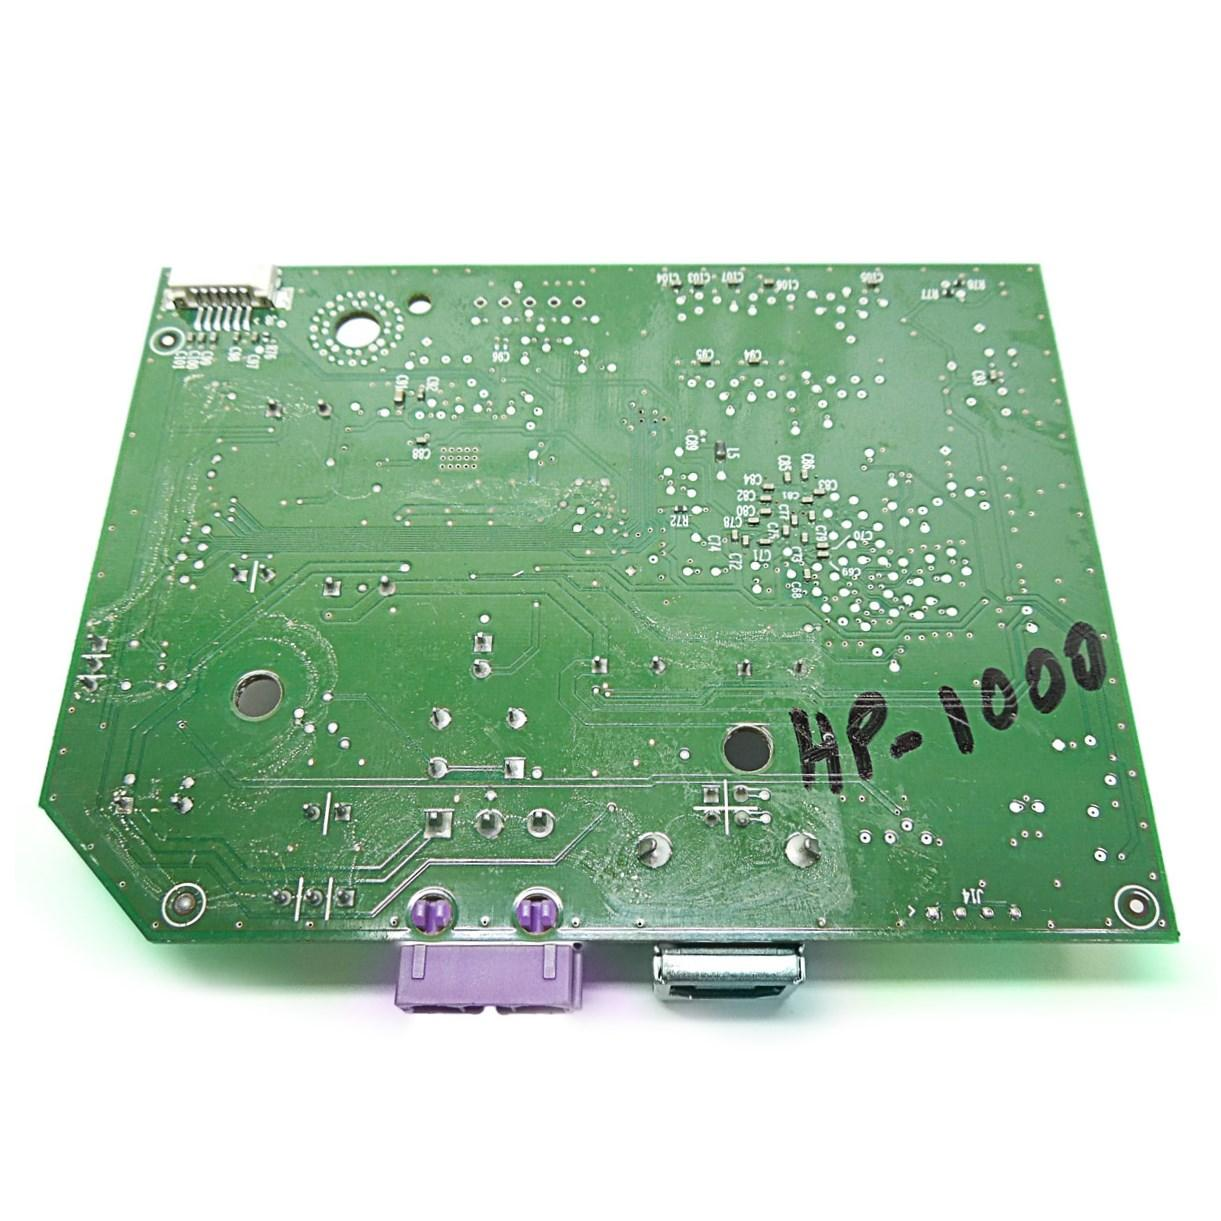 Placa Lógica da Multifuncional HP 1000 - CH340-80001